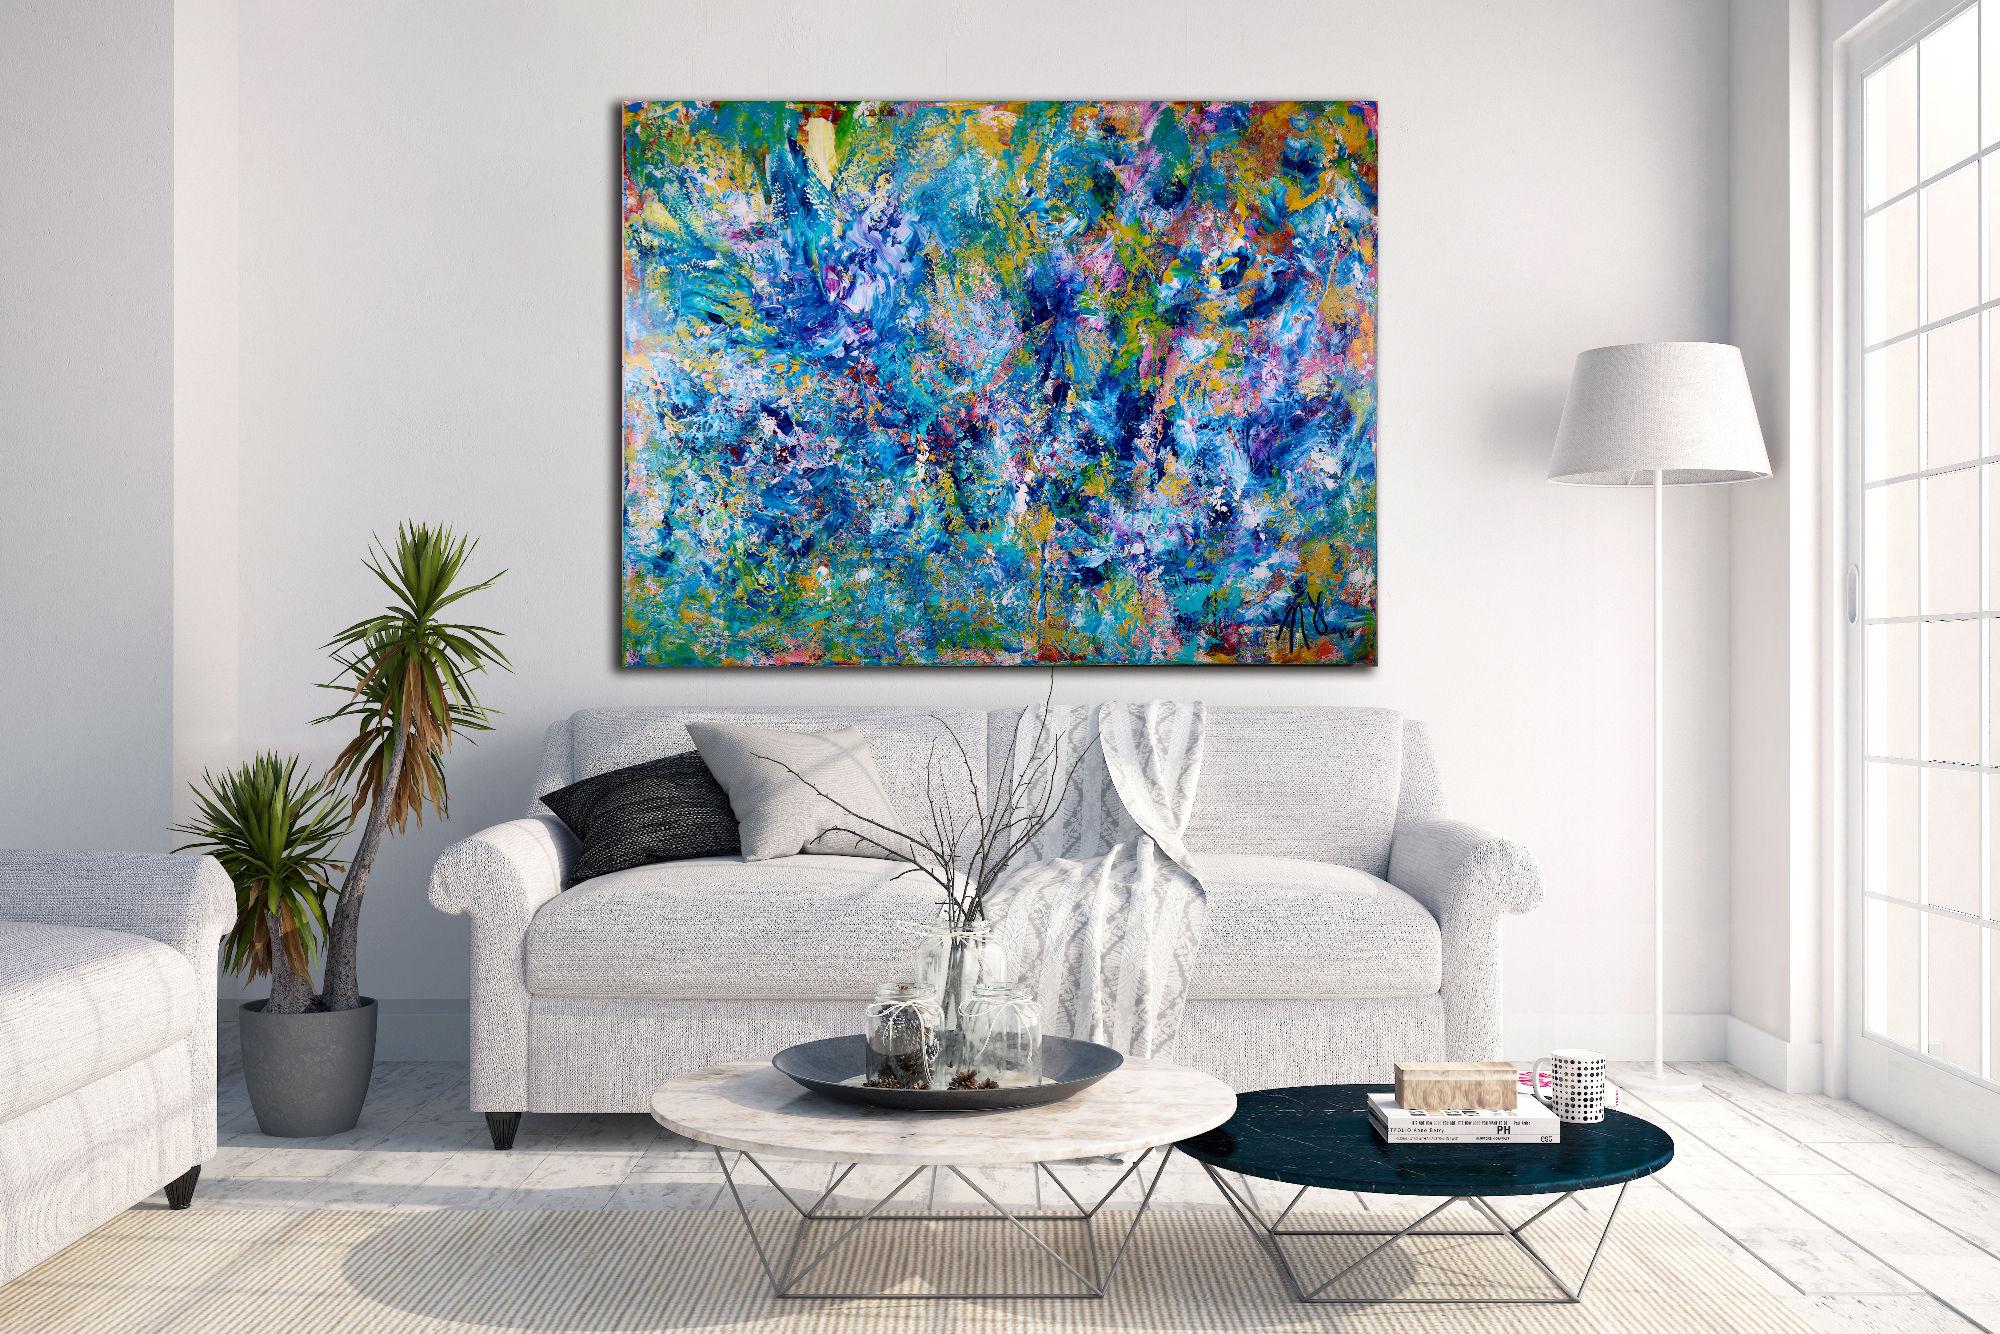 Blue Reunion - Organic Abstract - DEEP EDGE READY TO HANG (2016) Acrylic painting by Nestor Toro